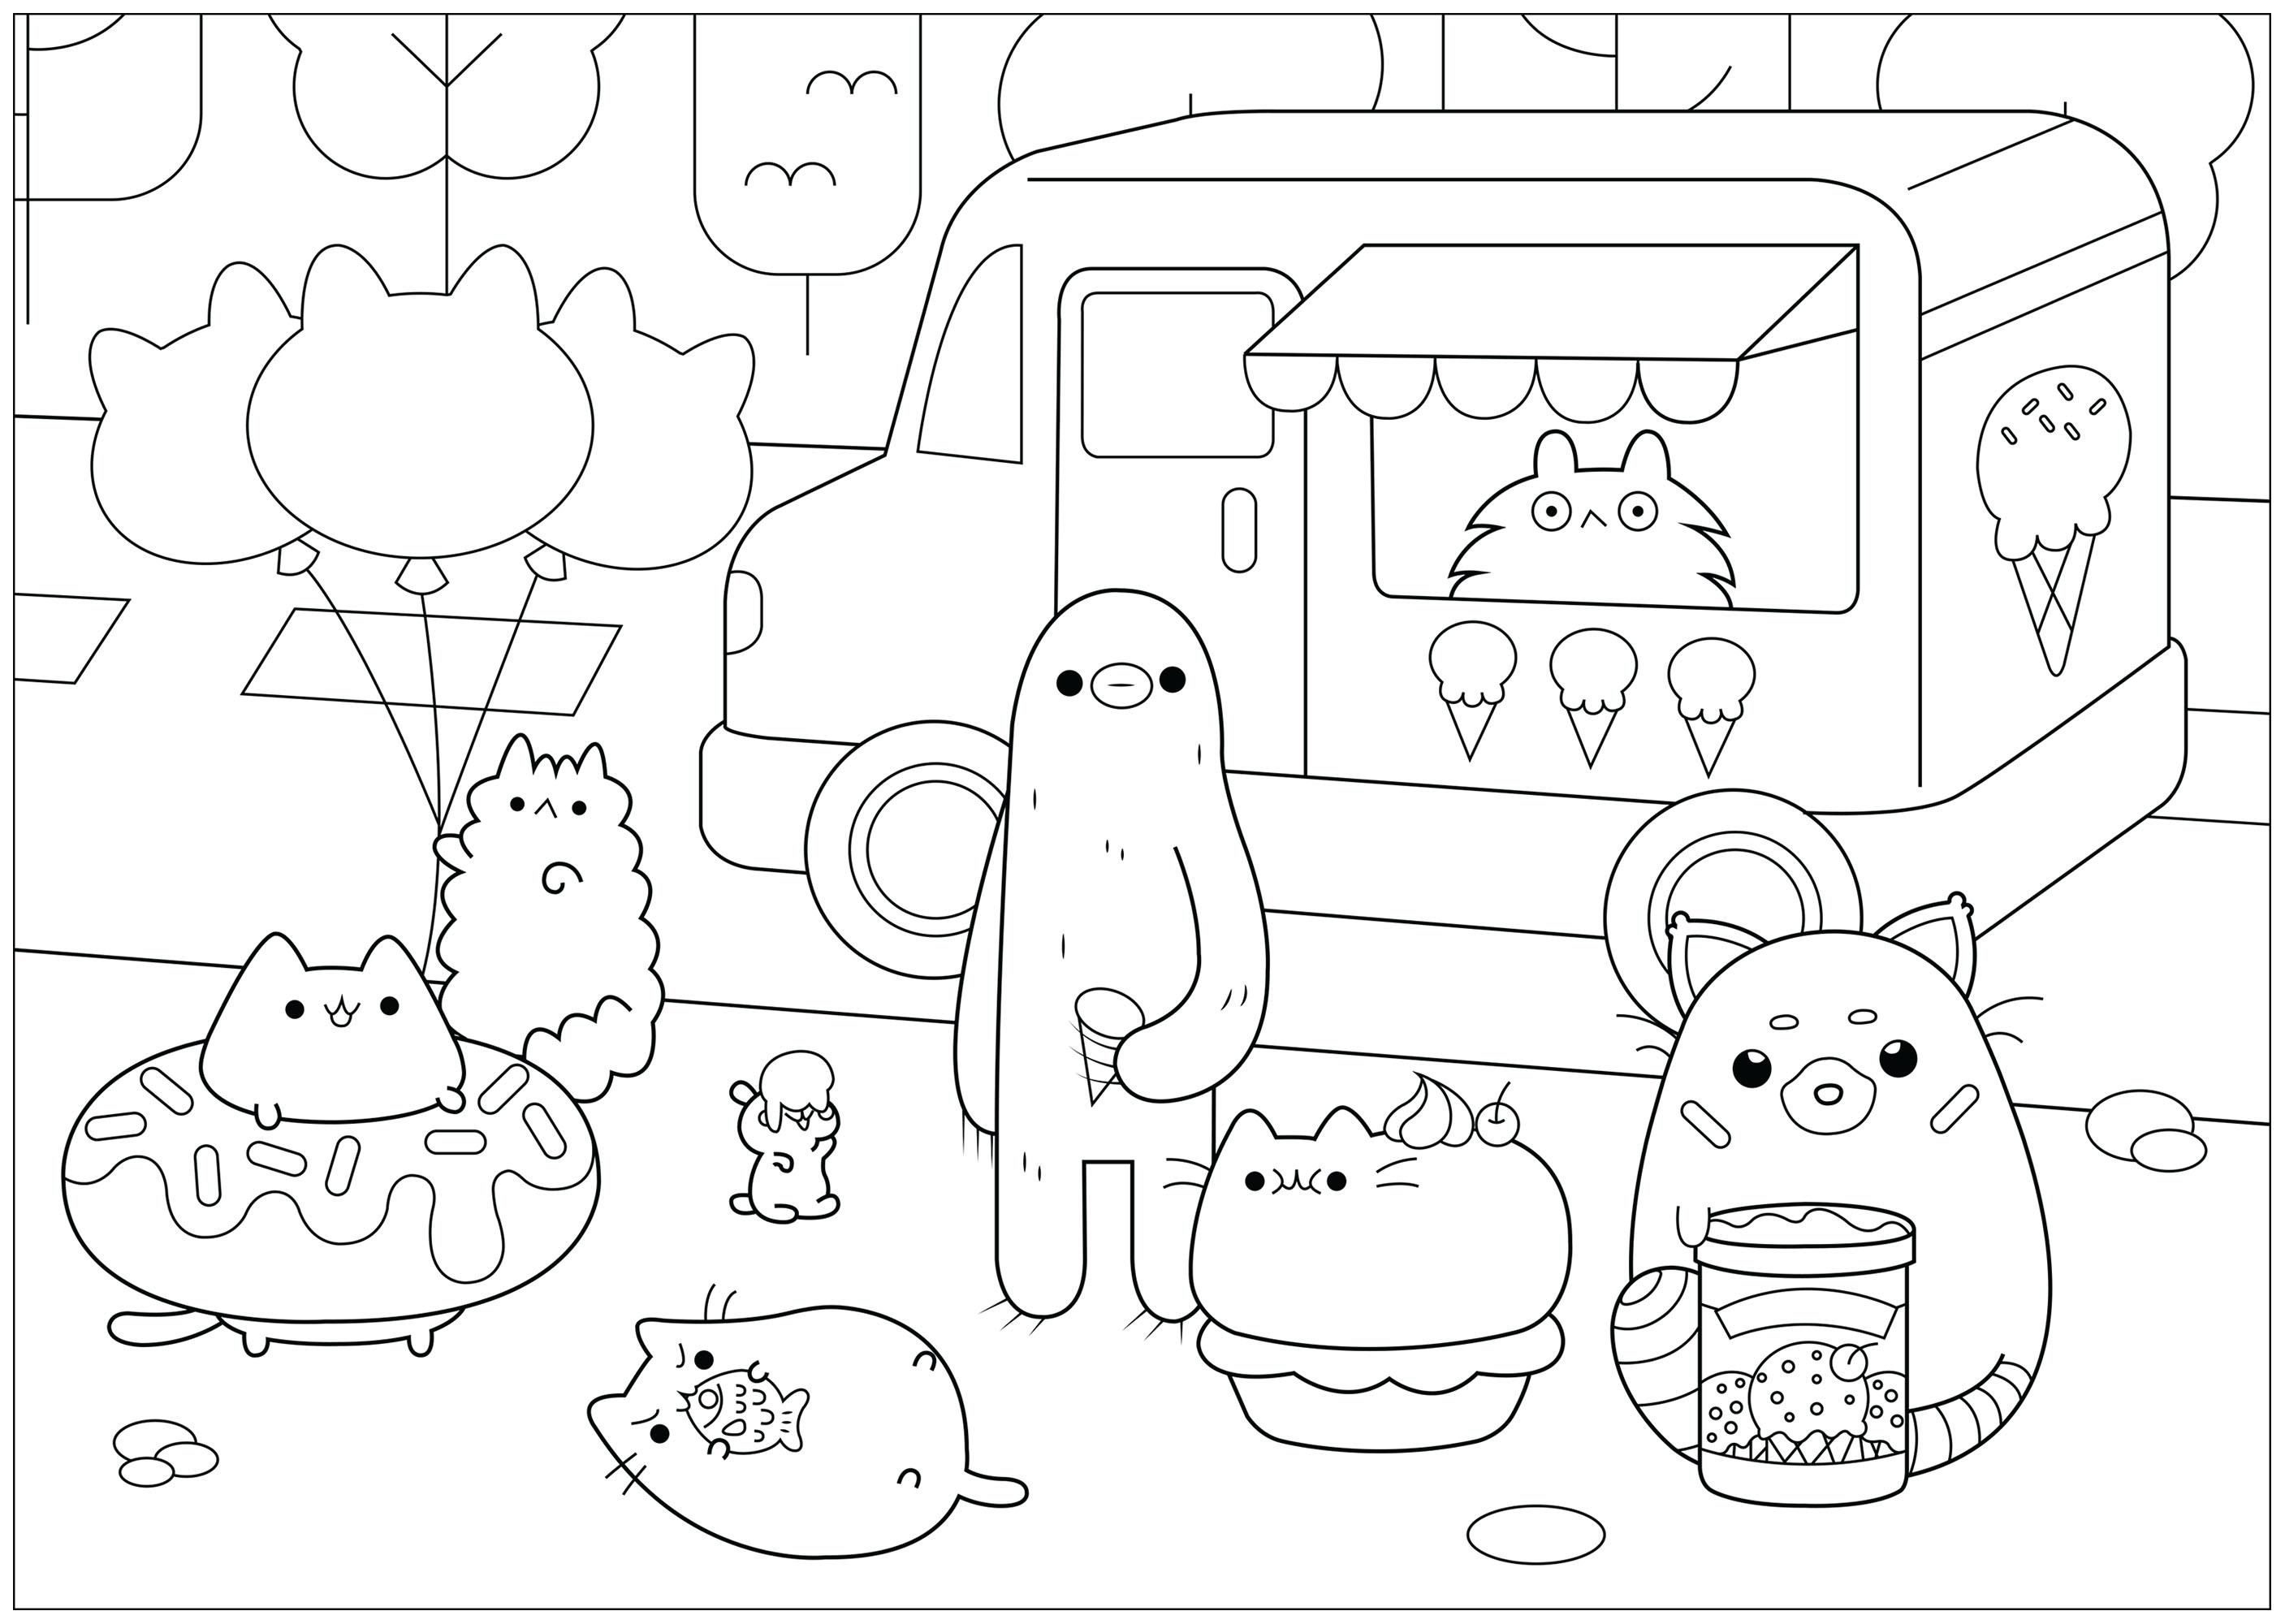 Dibujos De Pusheen 🐈 Para Colorear